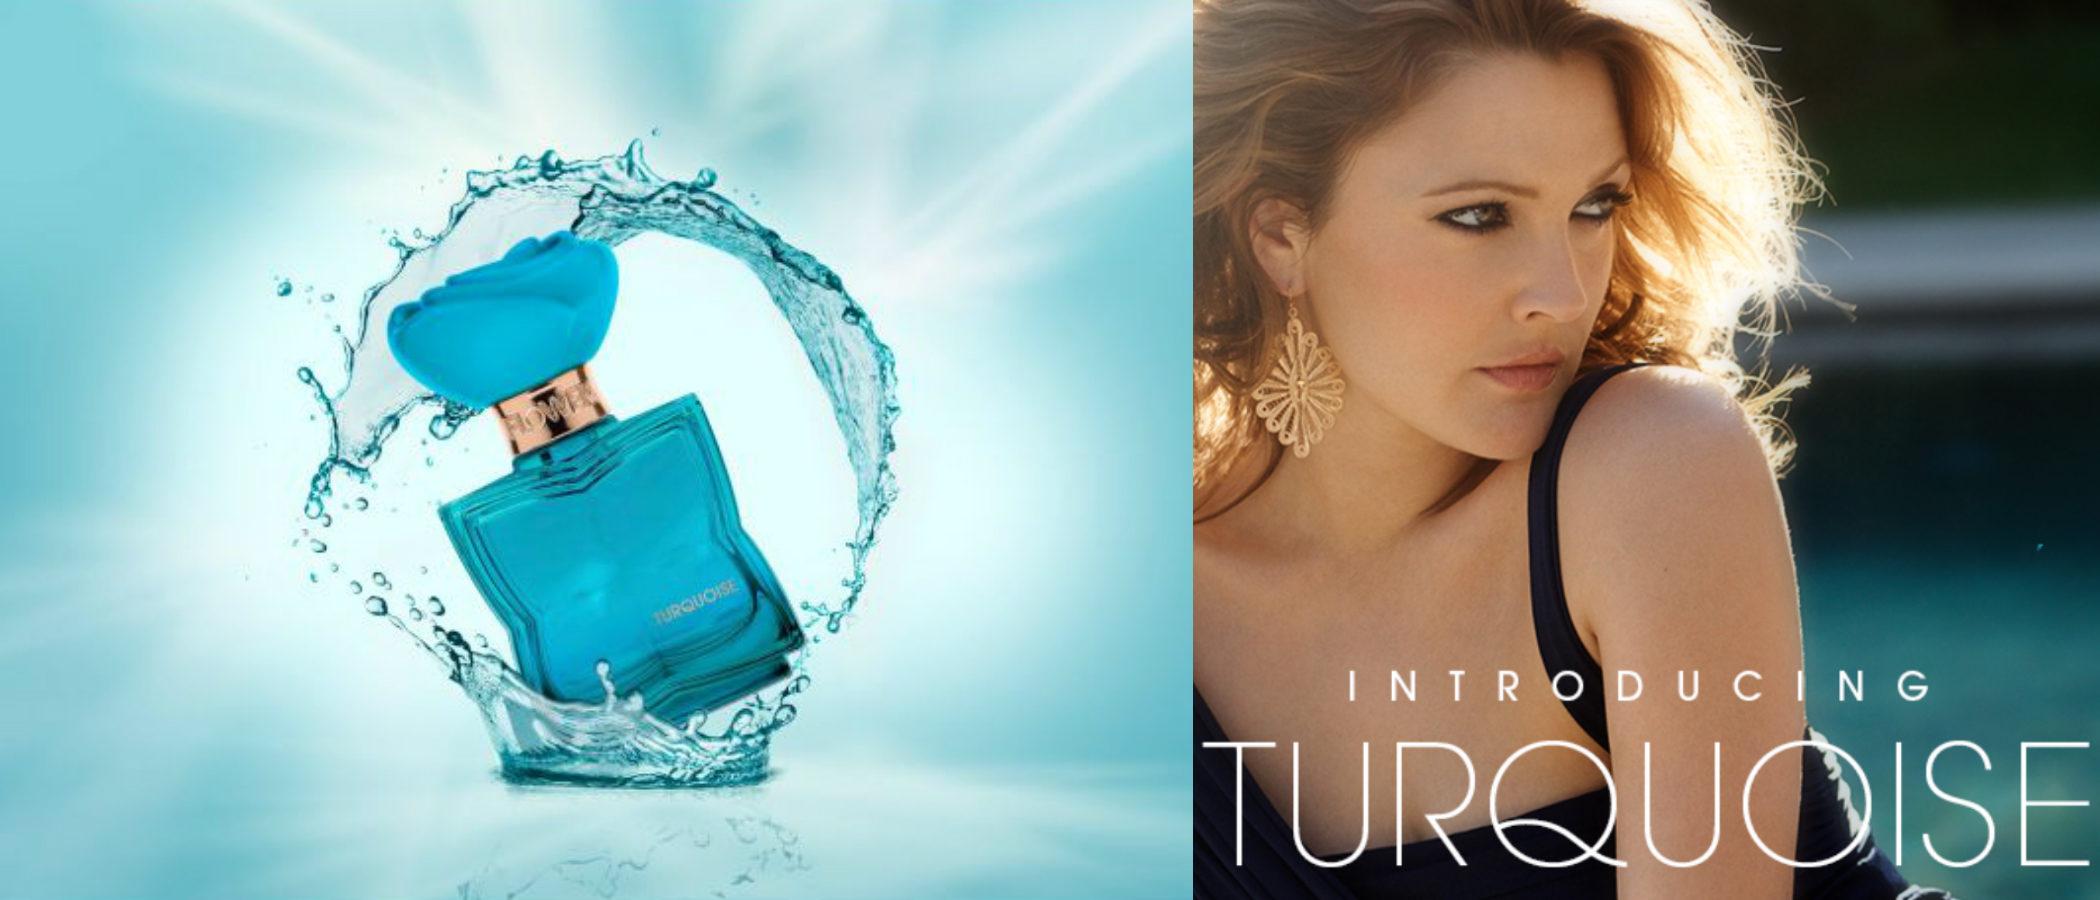 Drew Barrymore presenta 'Turquoise', la sexta fragancia de su firma Flower